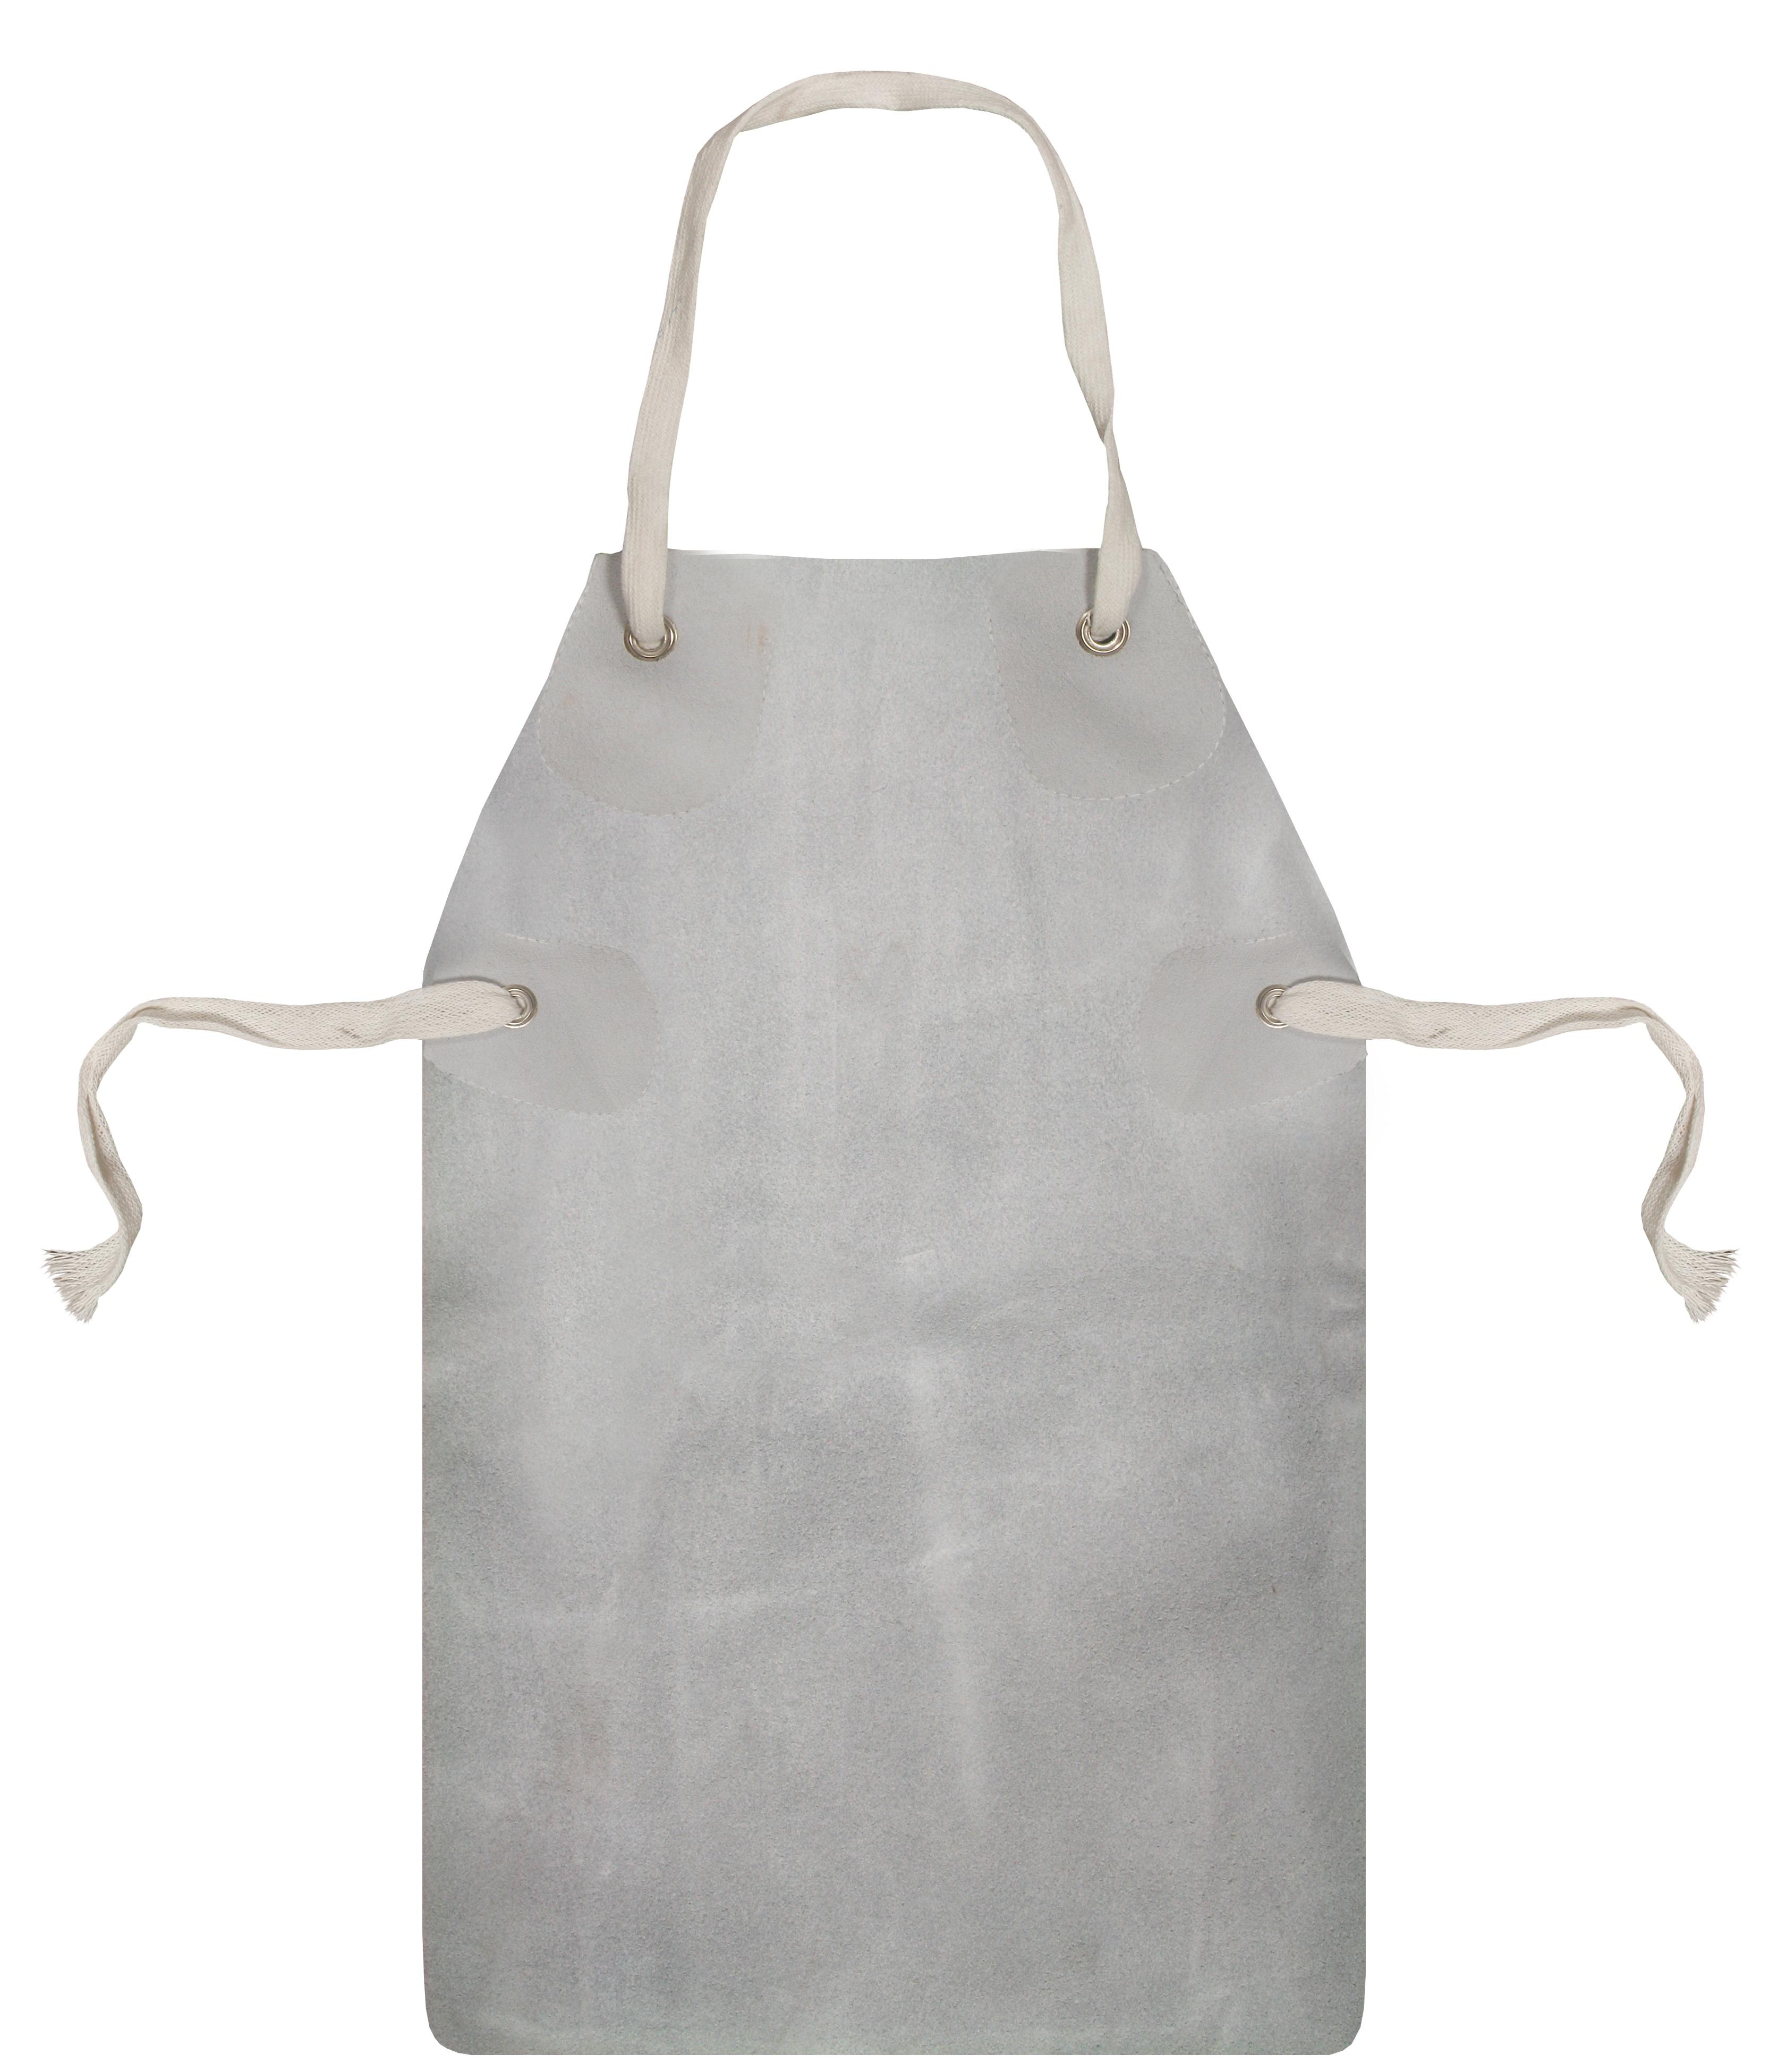 ... equipment welding workwear protection welding apron previous next